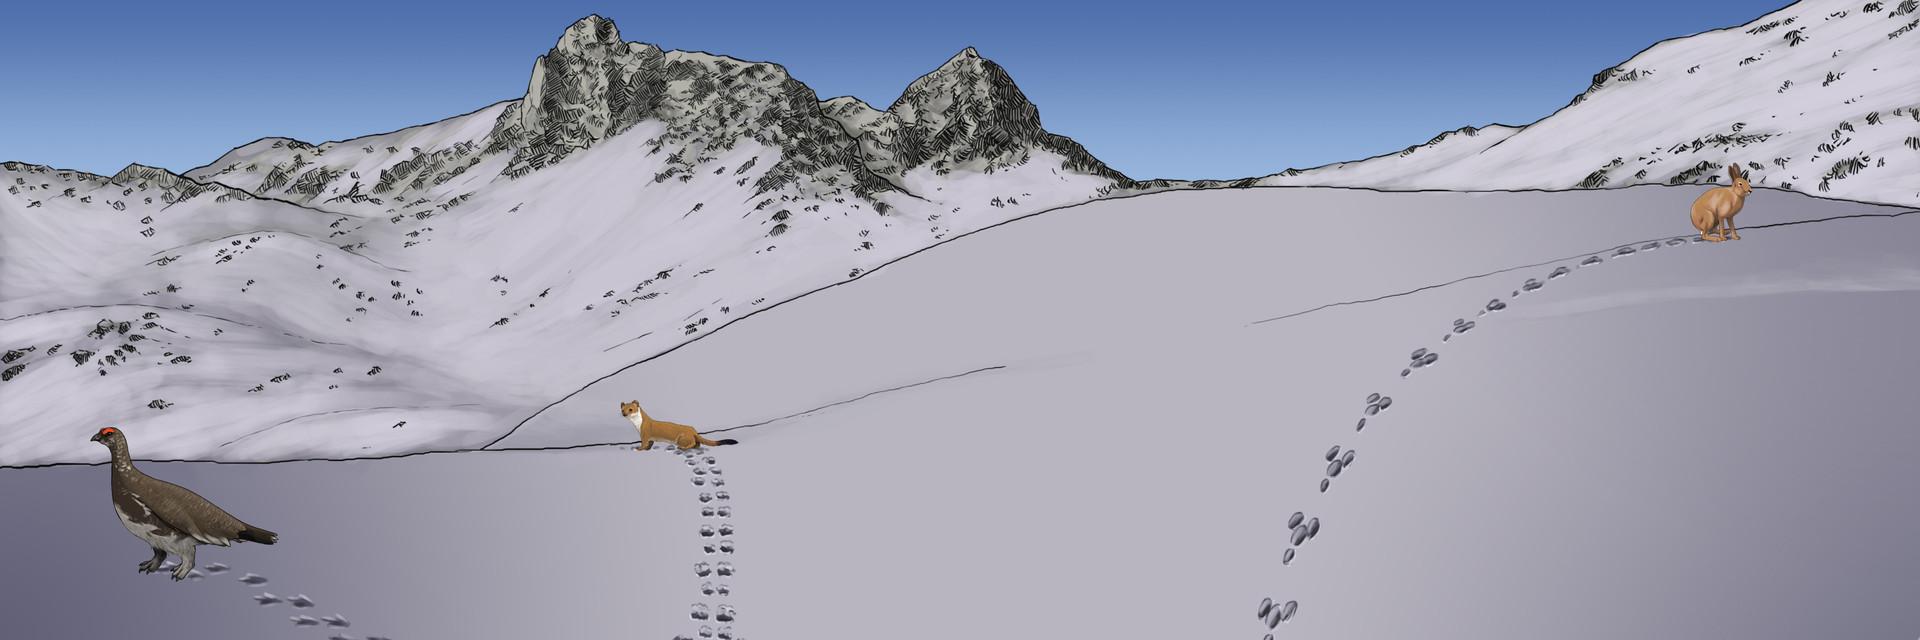 Paysage - Alpage Hiver